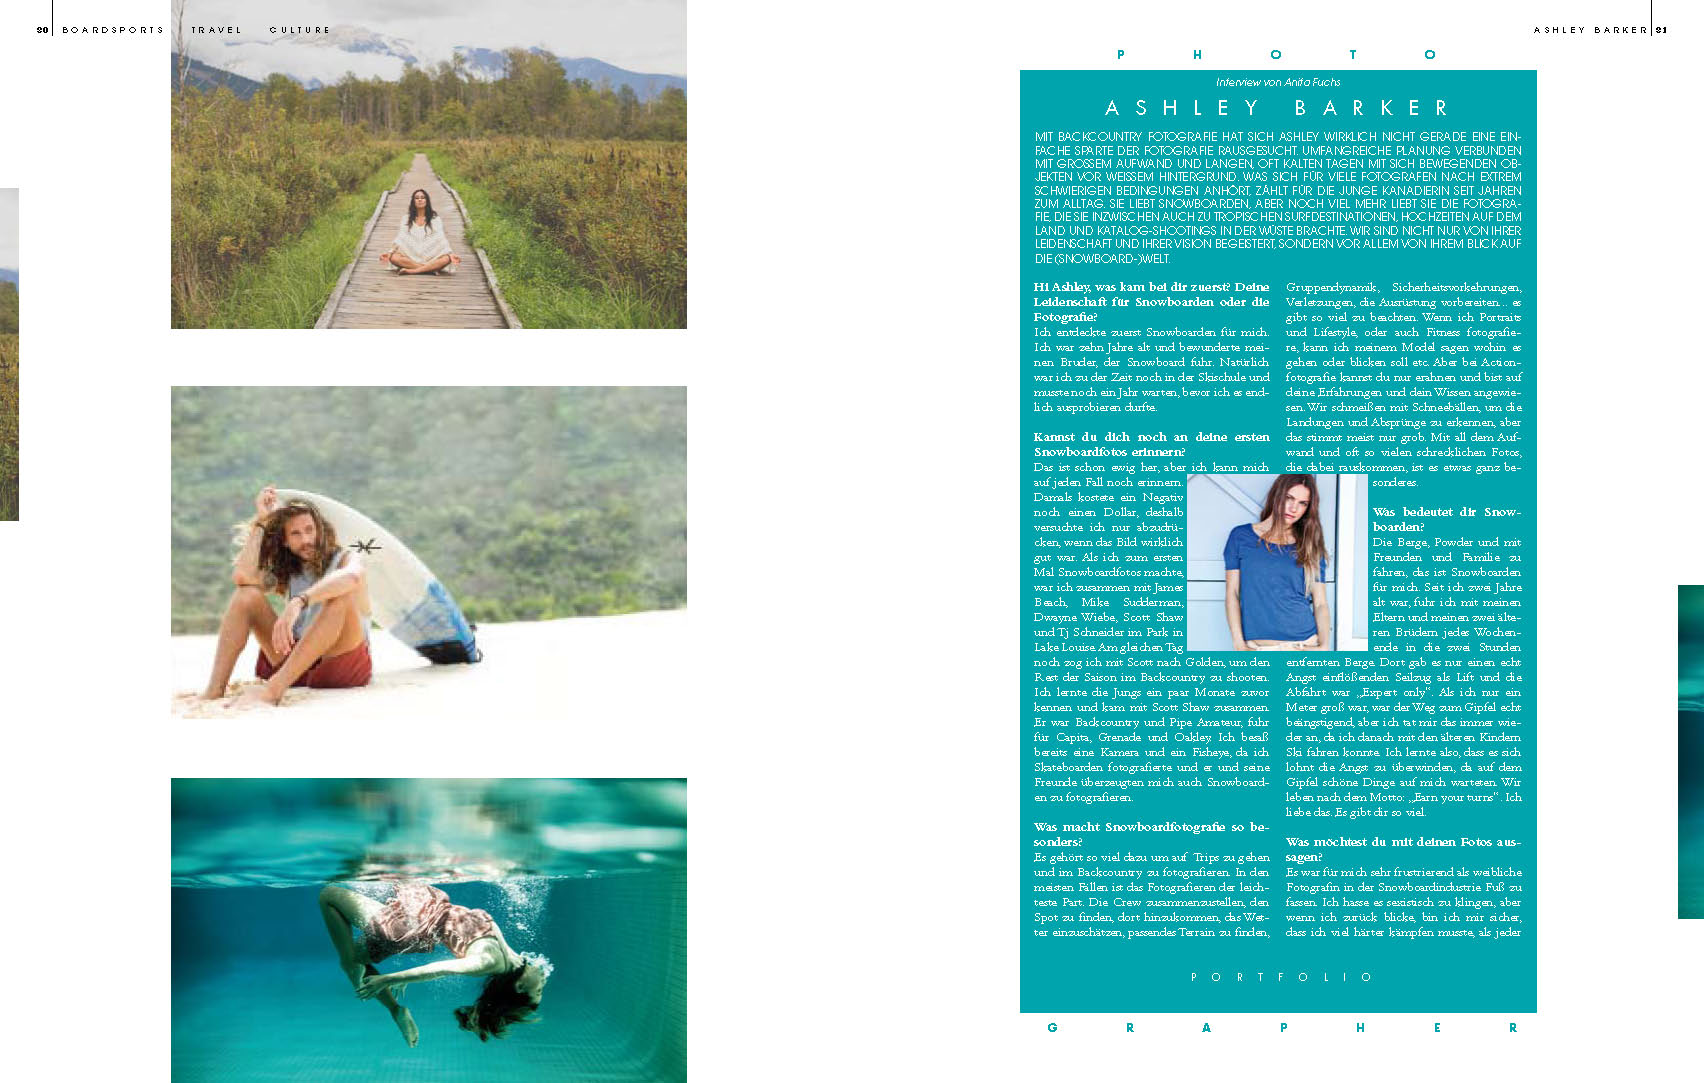 GoldenRide_AshleyBarker-page_2